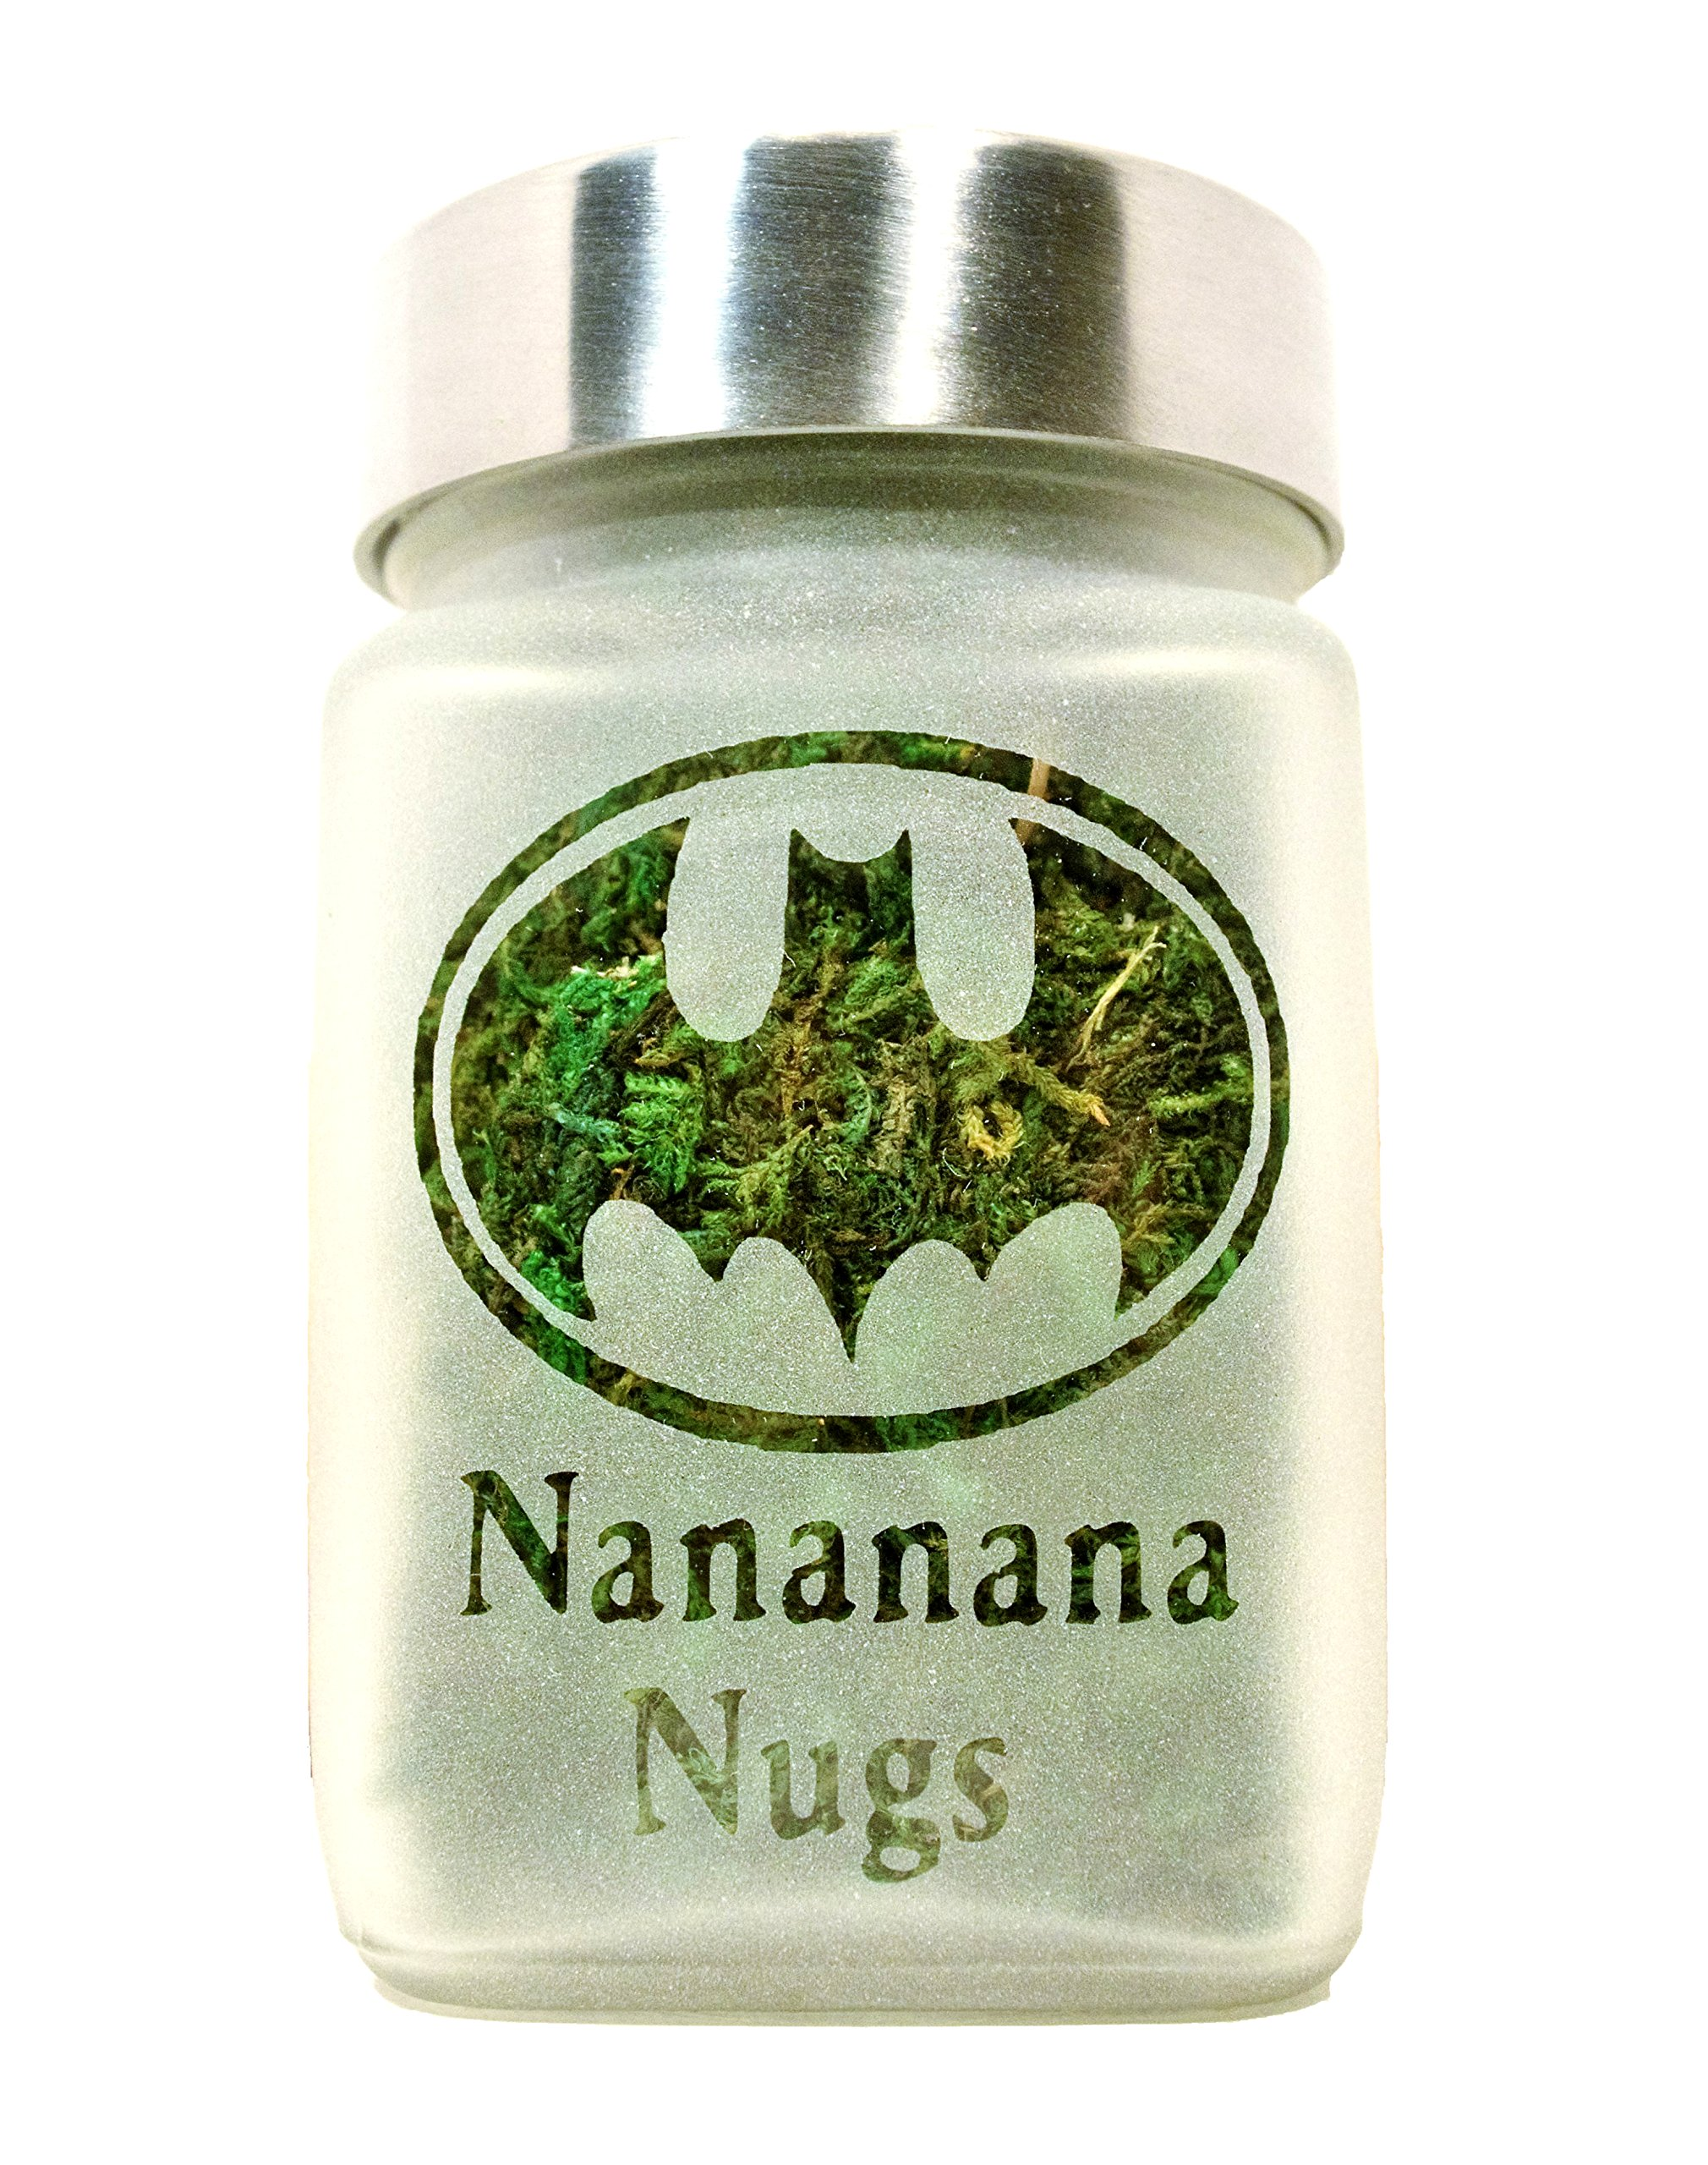 Retro Batman Stash Jar | Nananana Nugs Weed Jar and Weed Accessories | Stoner Gifts, Stash Jars & Stoner Accessories